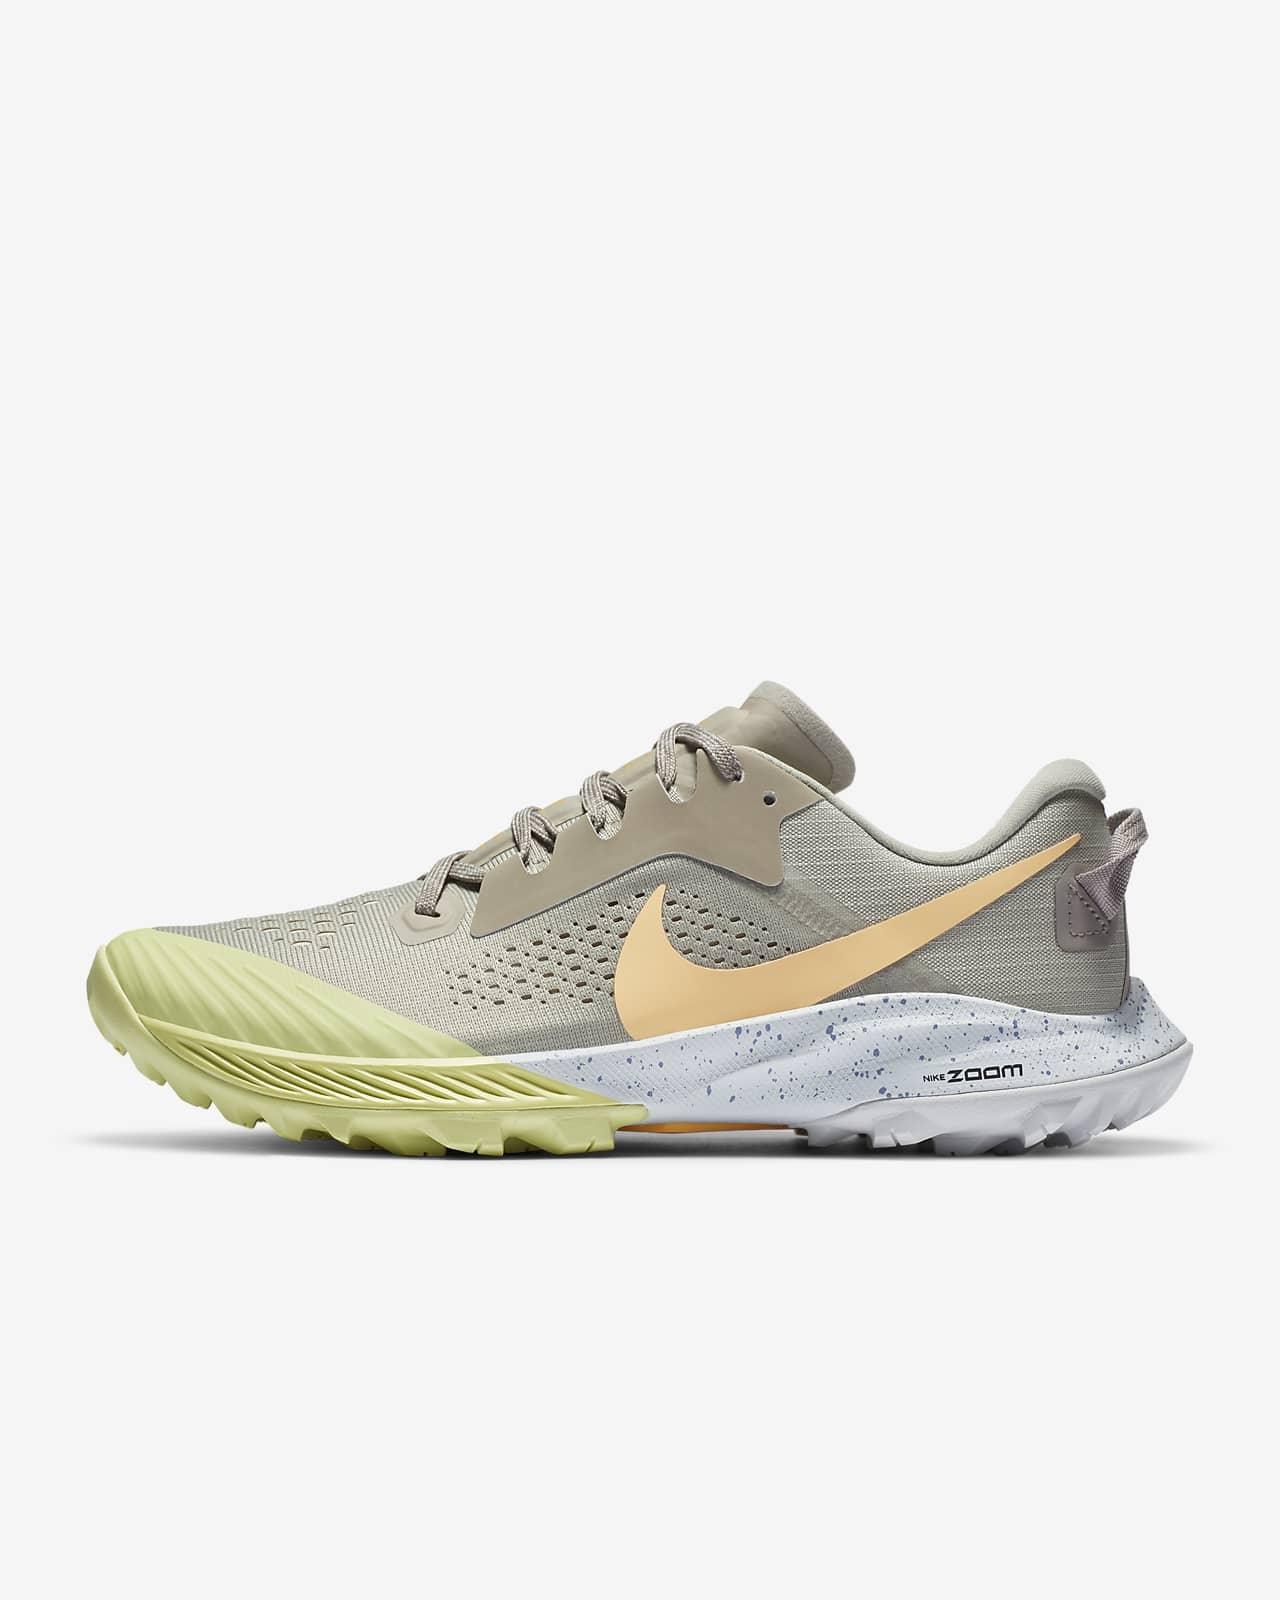 Bailarín Tomar conciencia Santuario  Nike Air Zoom Terra Kiger 6 Women's Trail Running Shoe. Nike ID